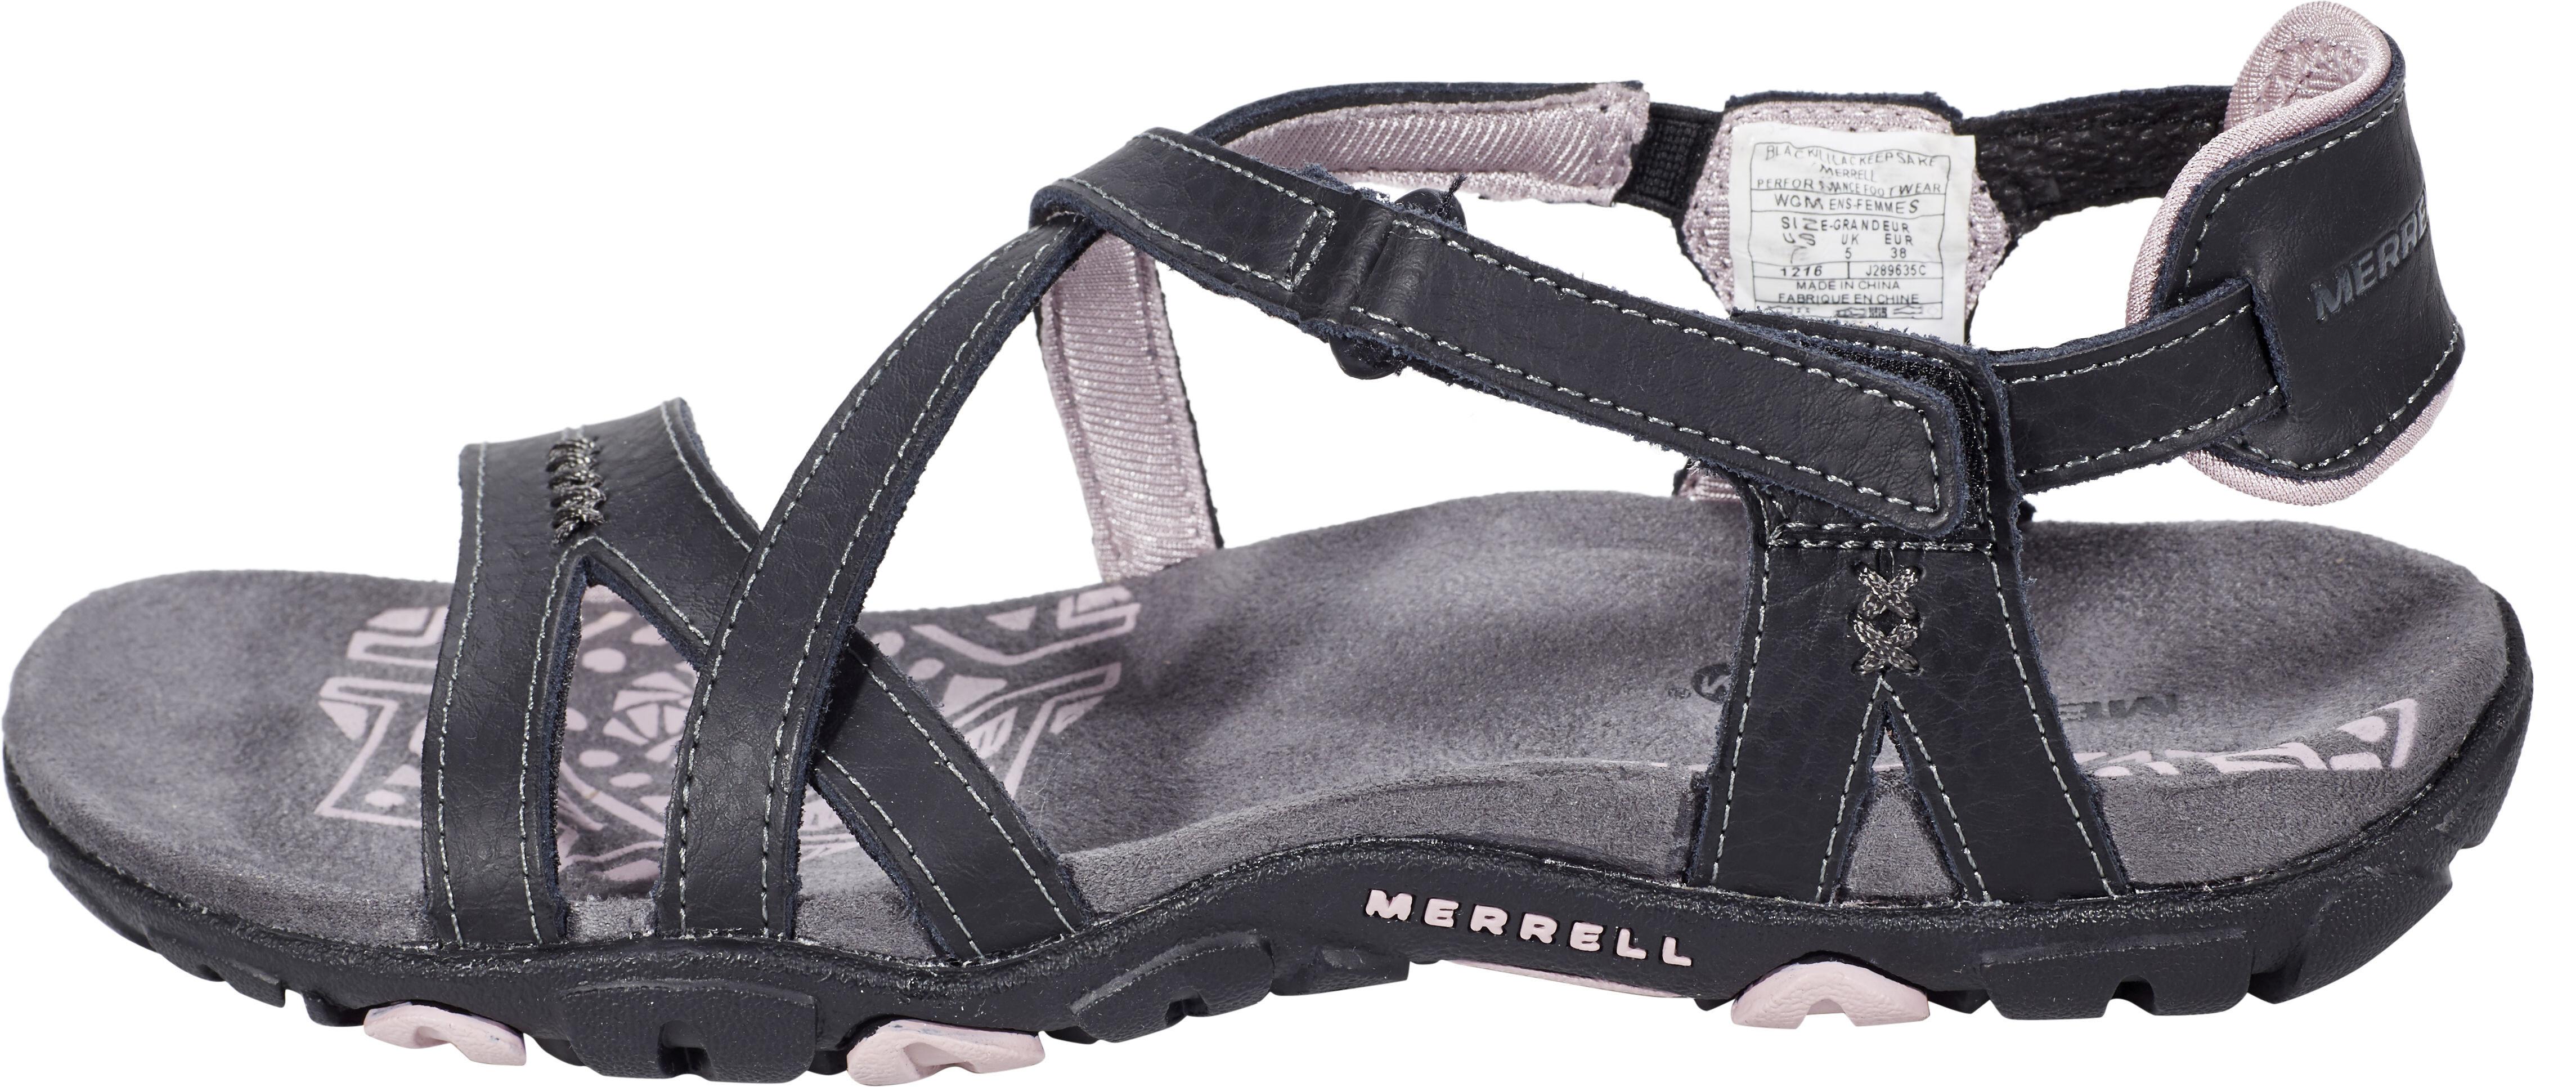 c5ad4e9fd58d Merrell Sandspur Rose LTR Sandals Women black at Addnature.co.uk